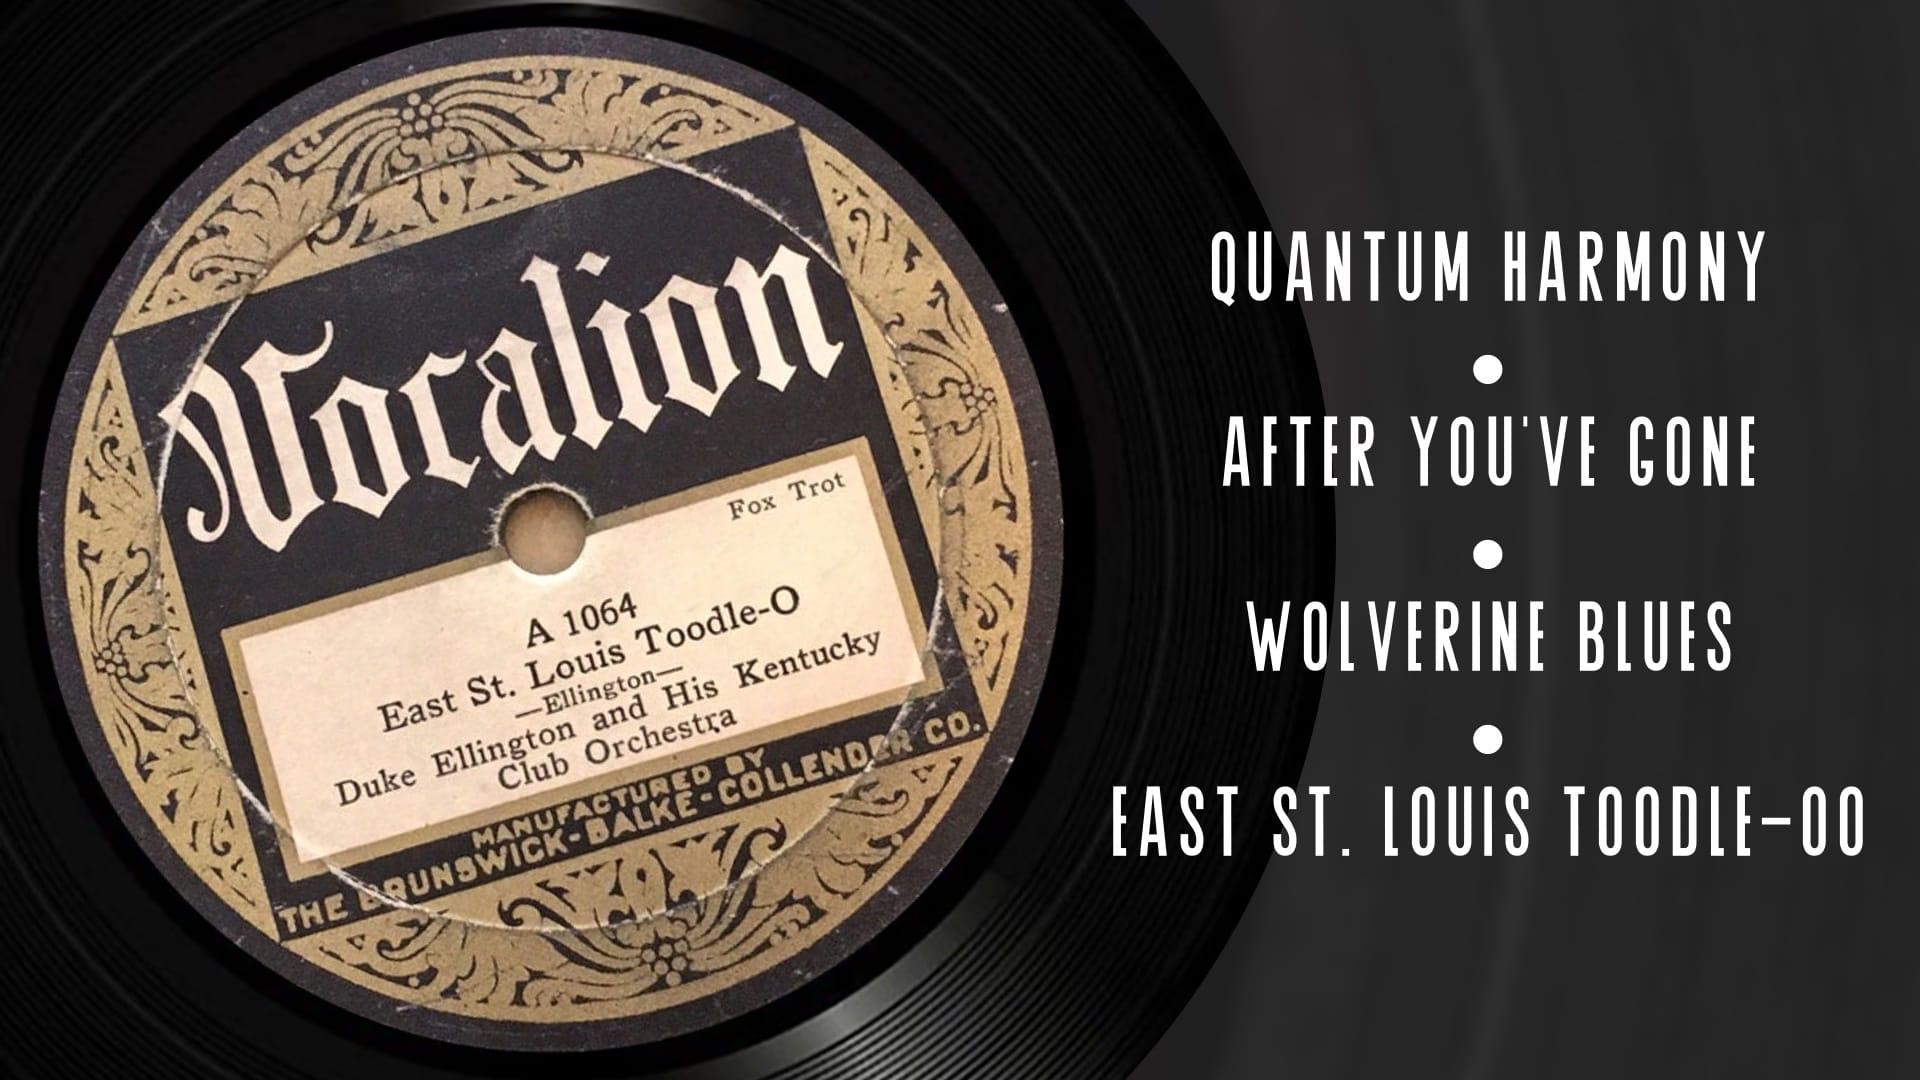 Ellington Quantum Harmony